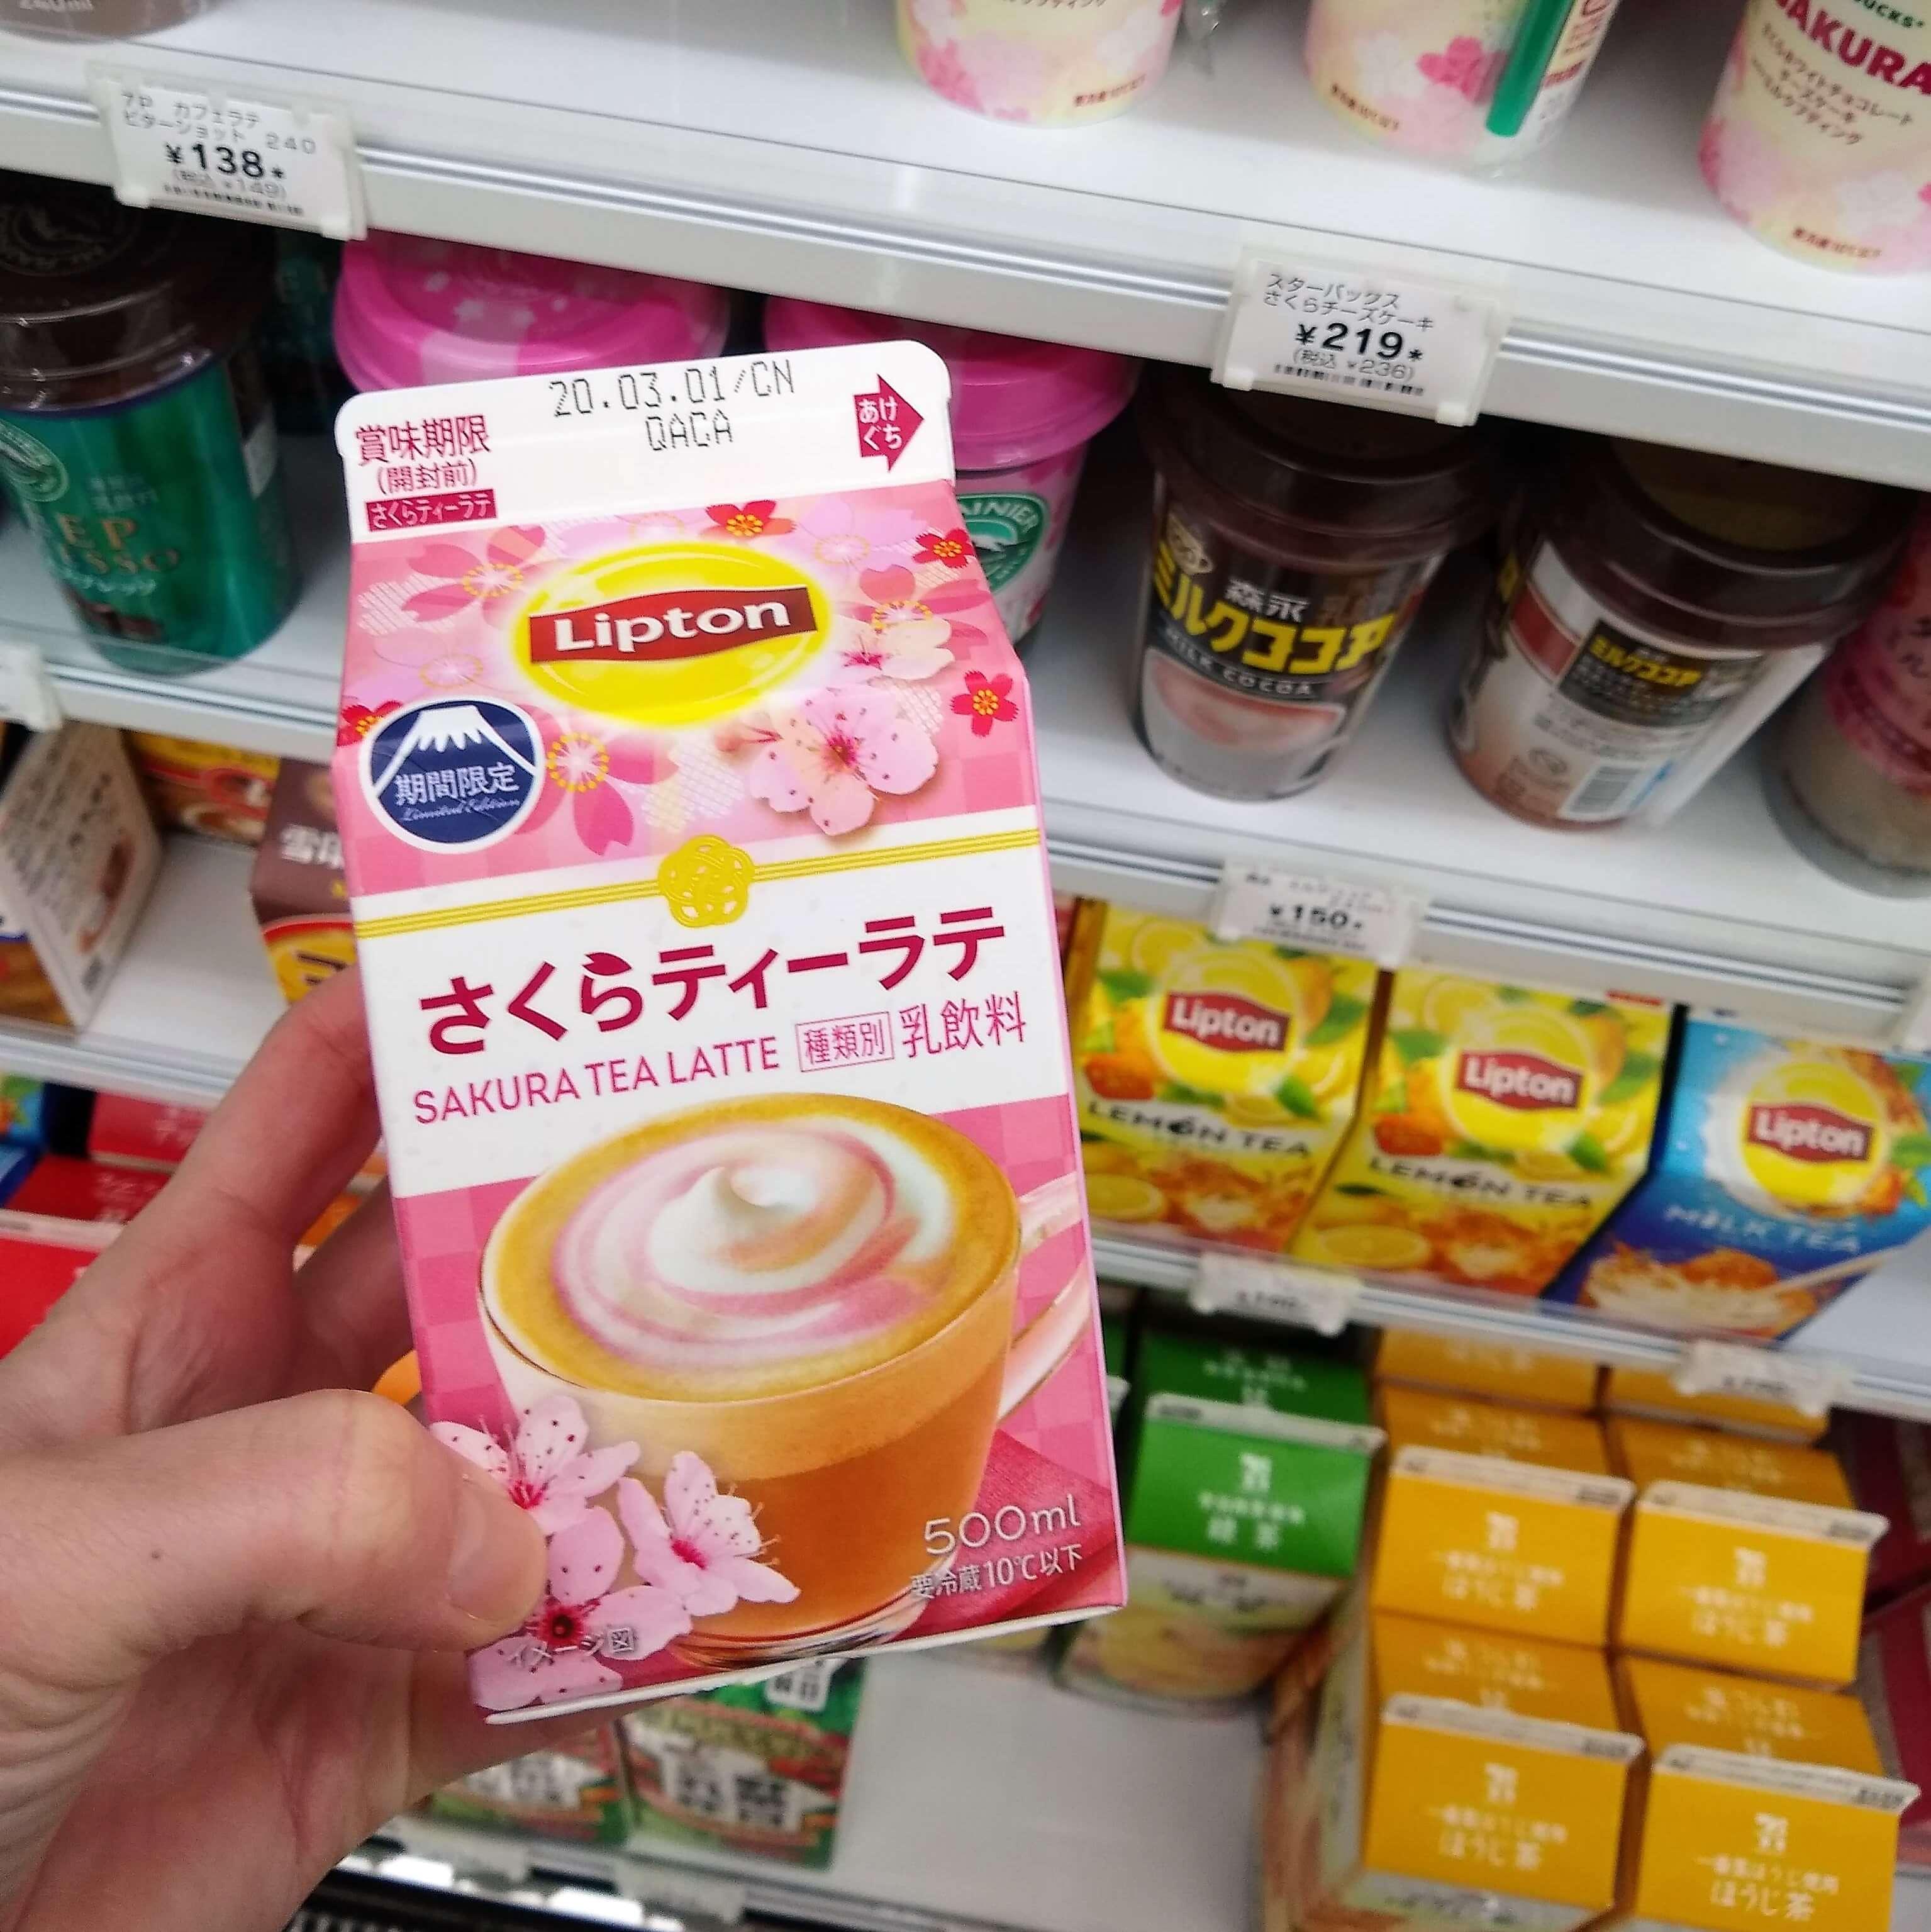 Lipton's Sakura Tea Latte